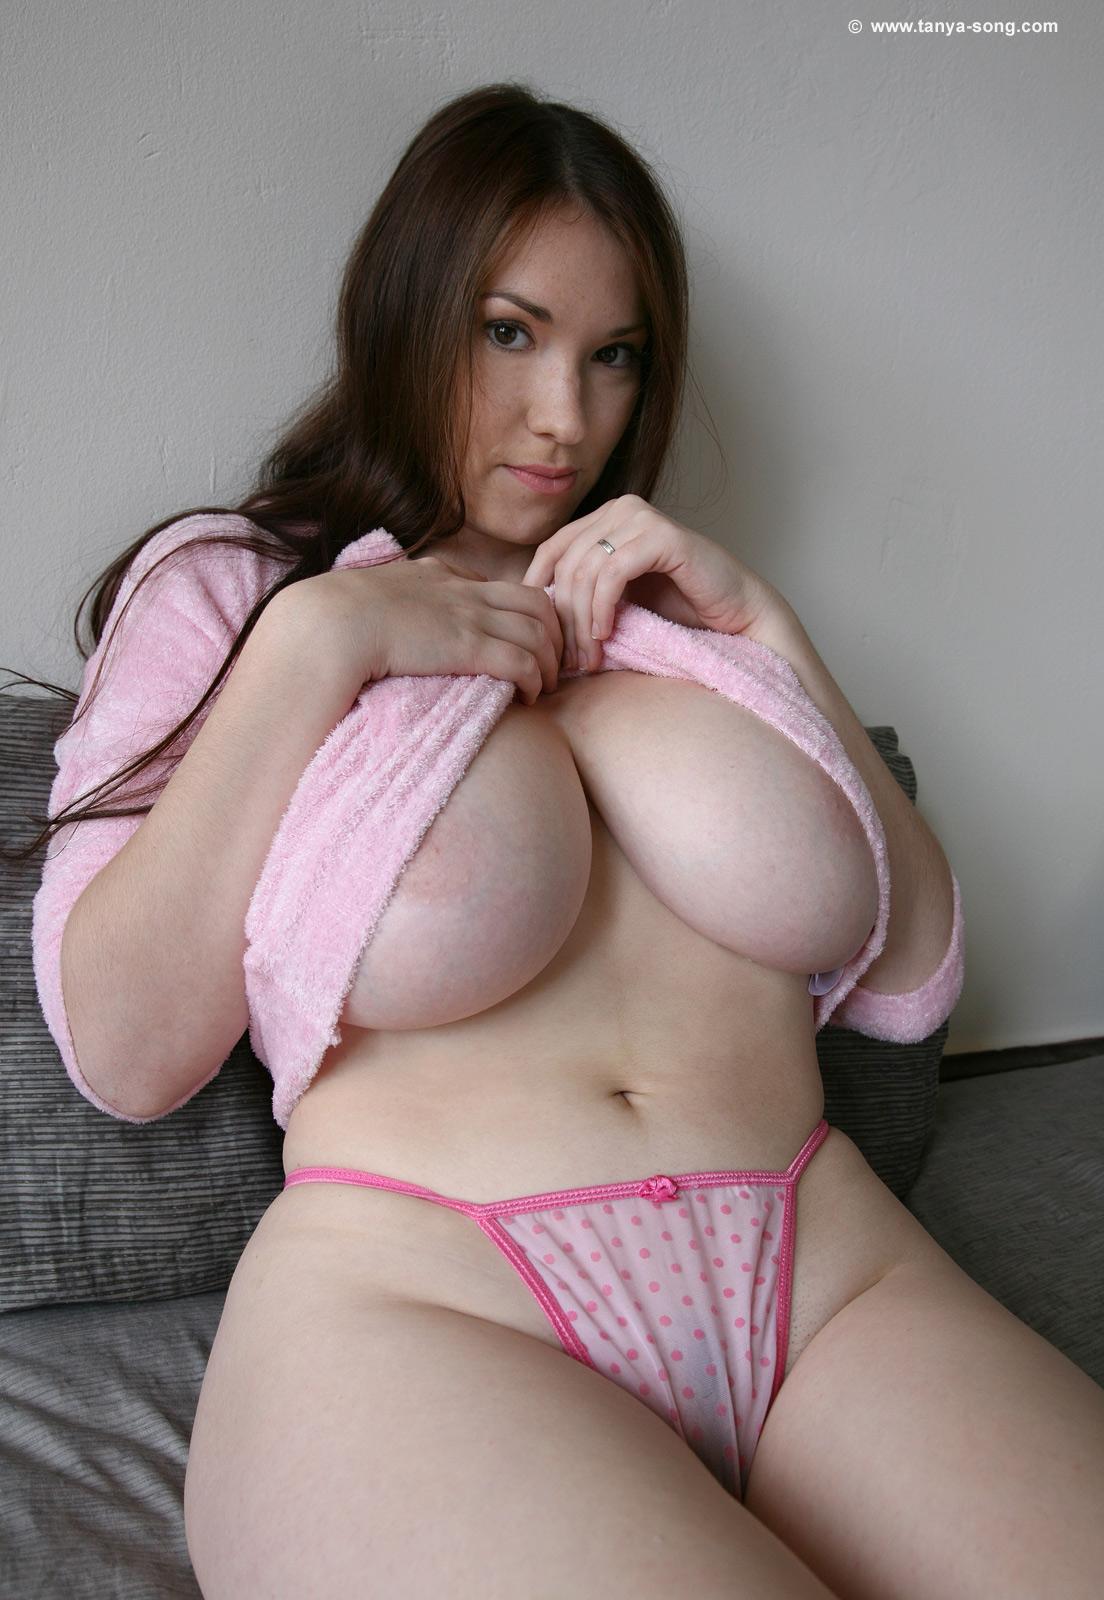 Horny milf tonya sinn wears stockings while she masturbates 8